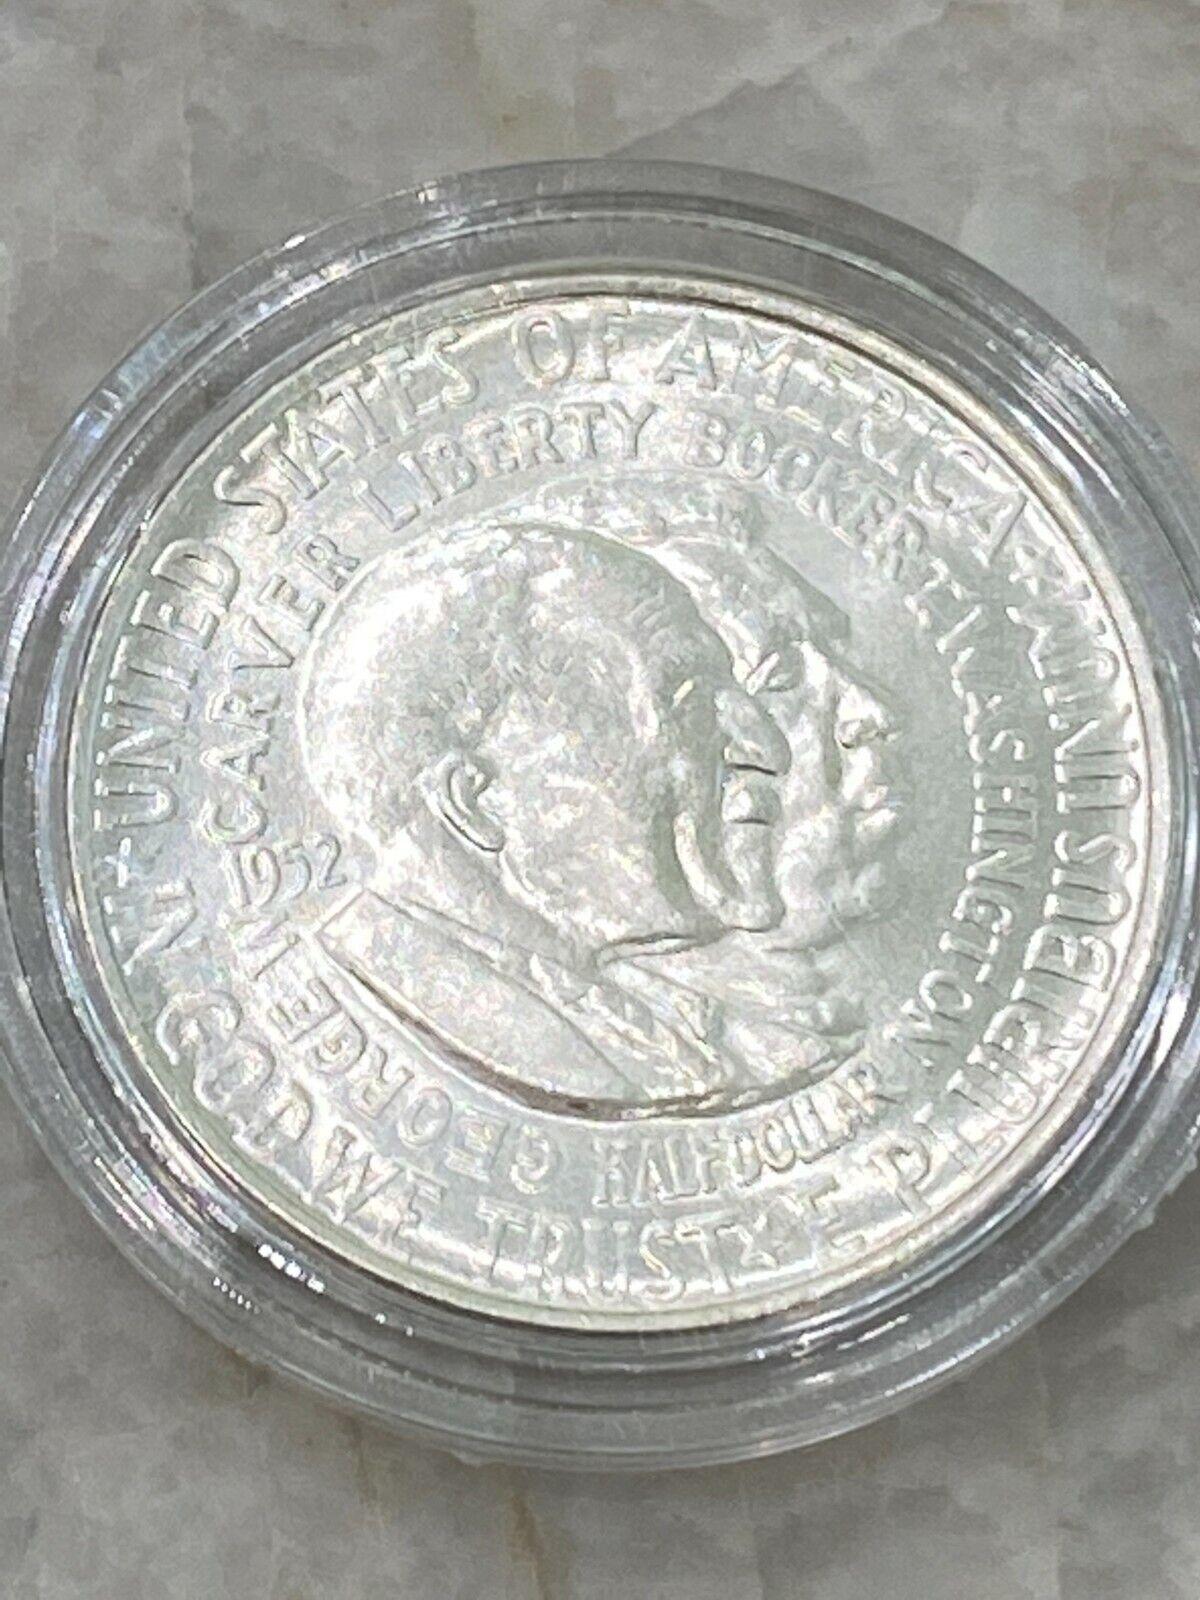 1952-P Washington - Carver 50C Silver Half Dollar - Commemorative - $9.55